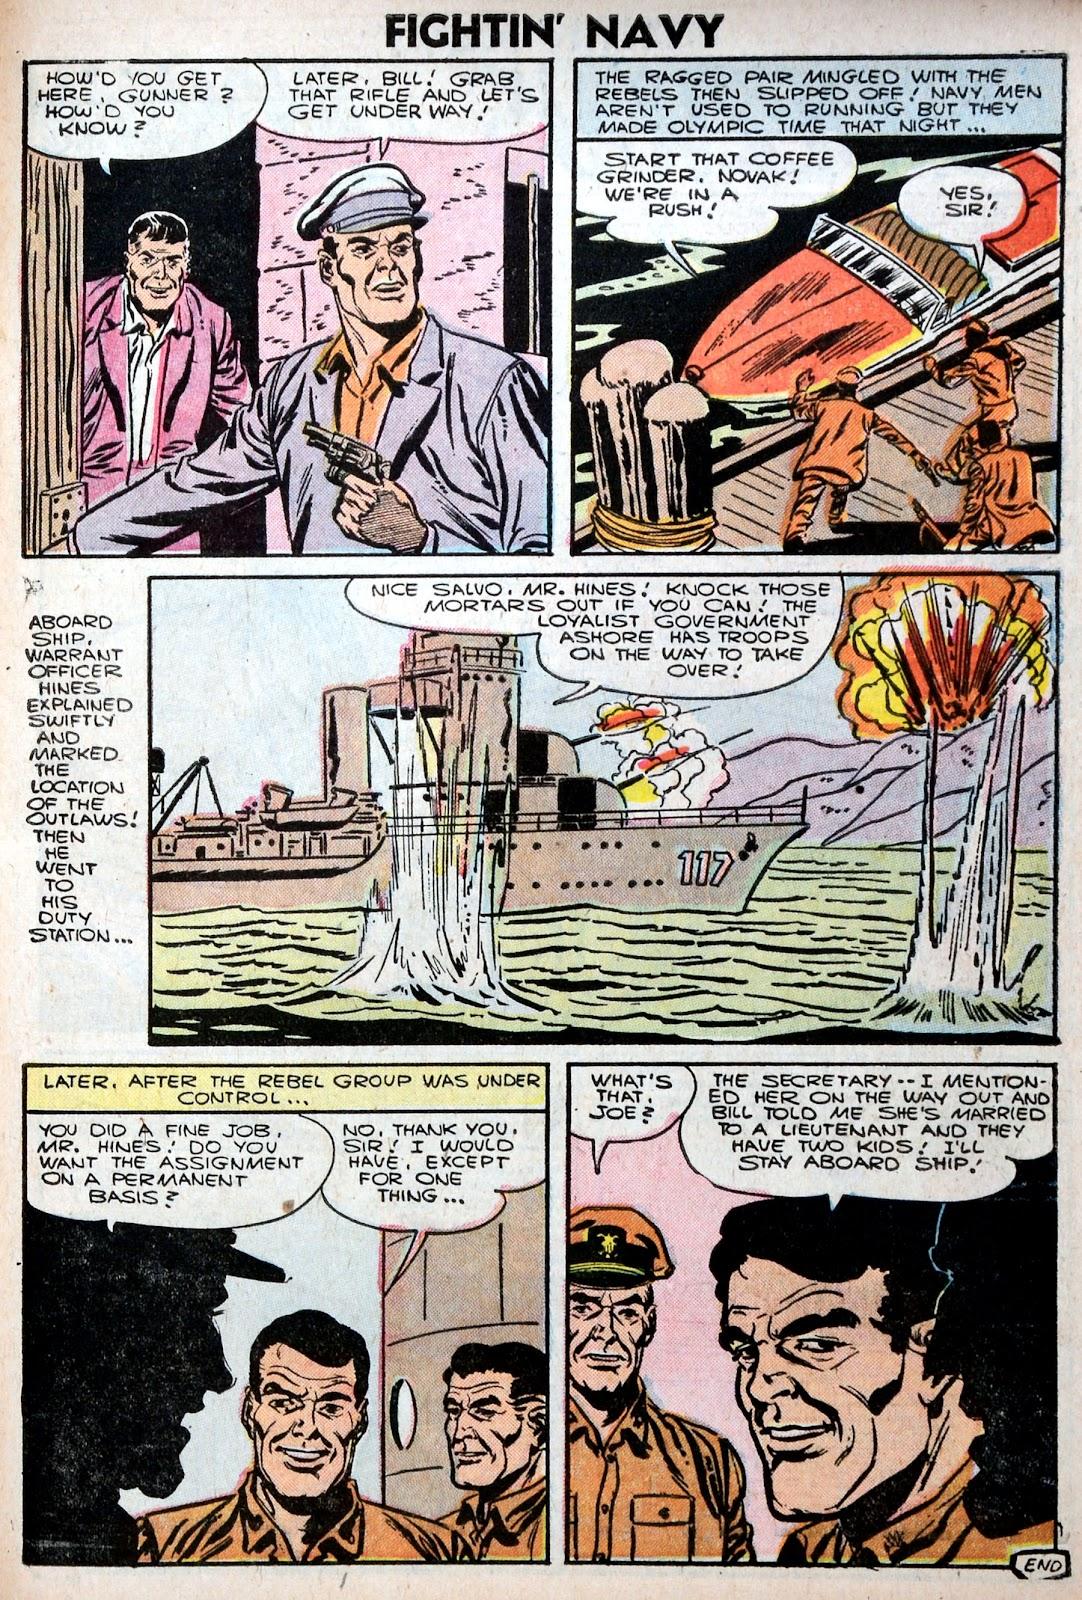 Read online Fightin' Navy comic -  Issue #75 - 27